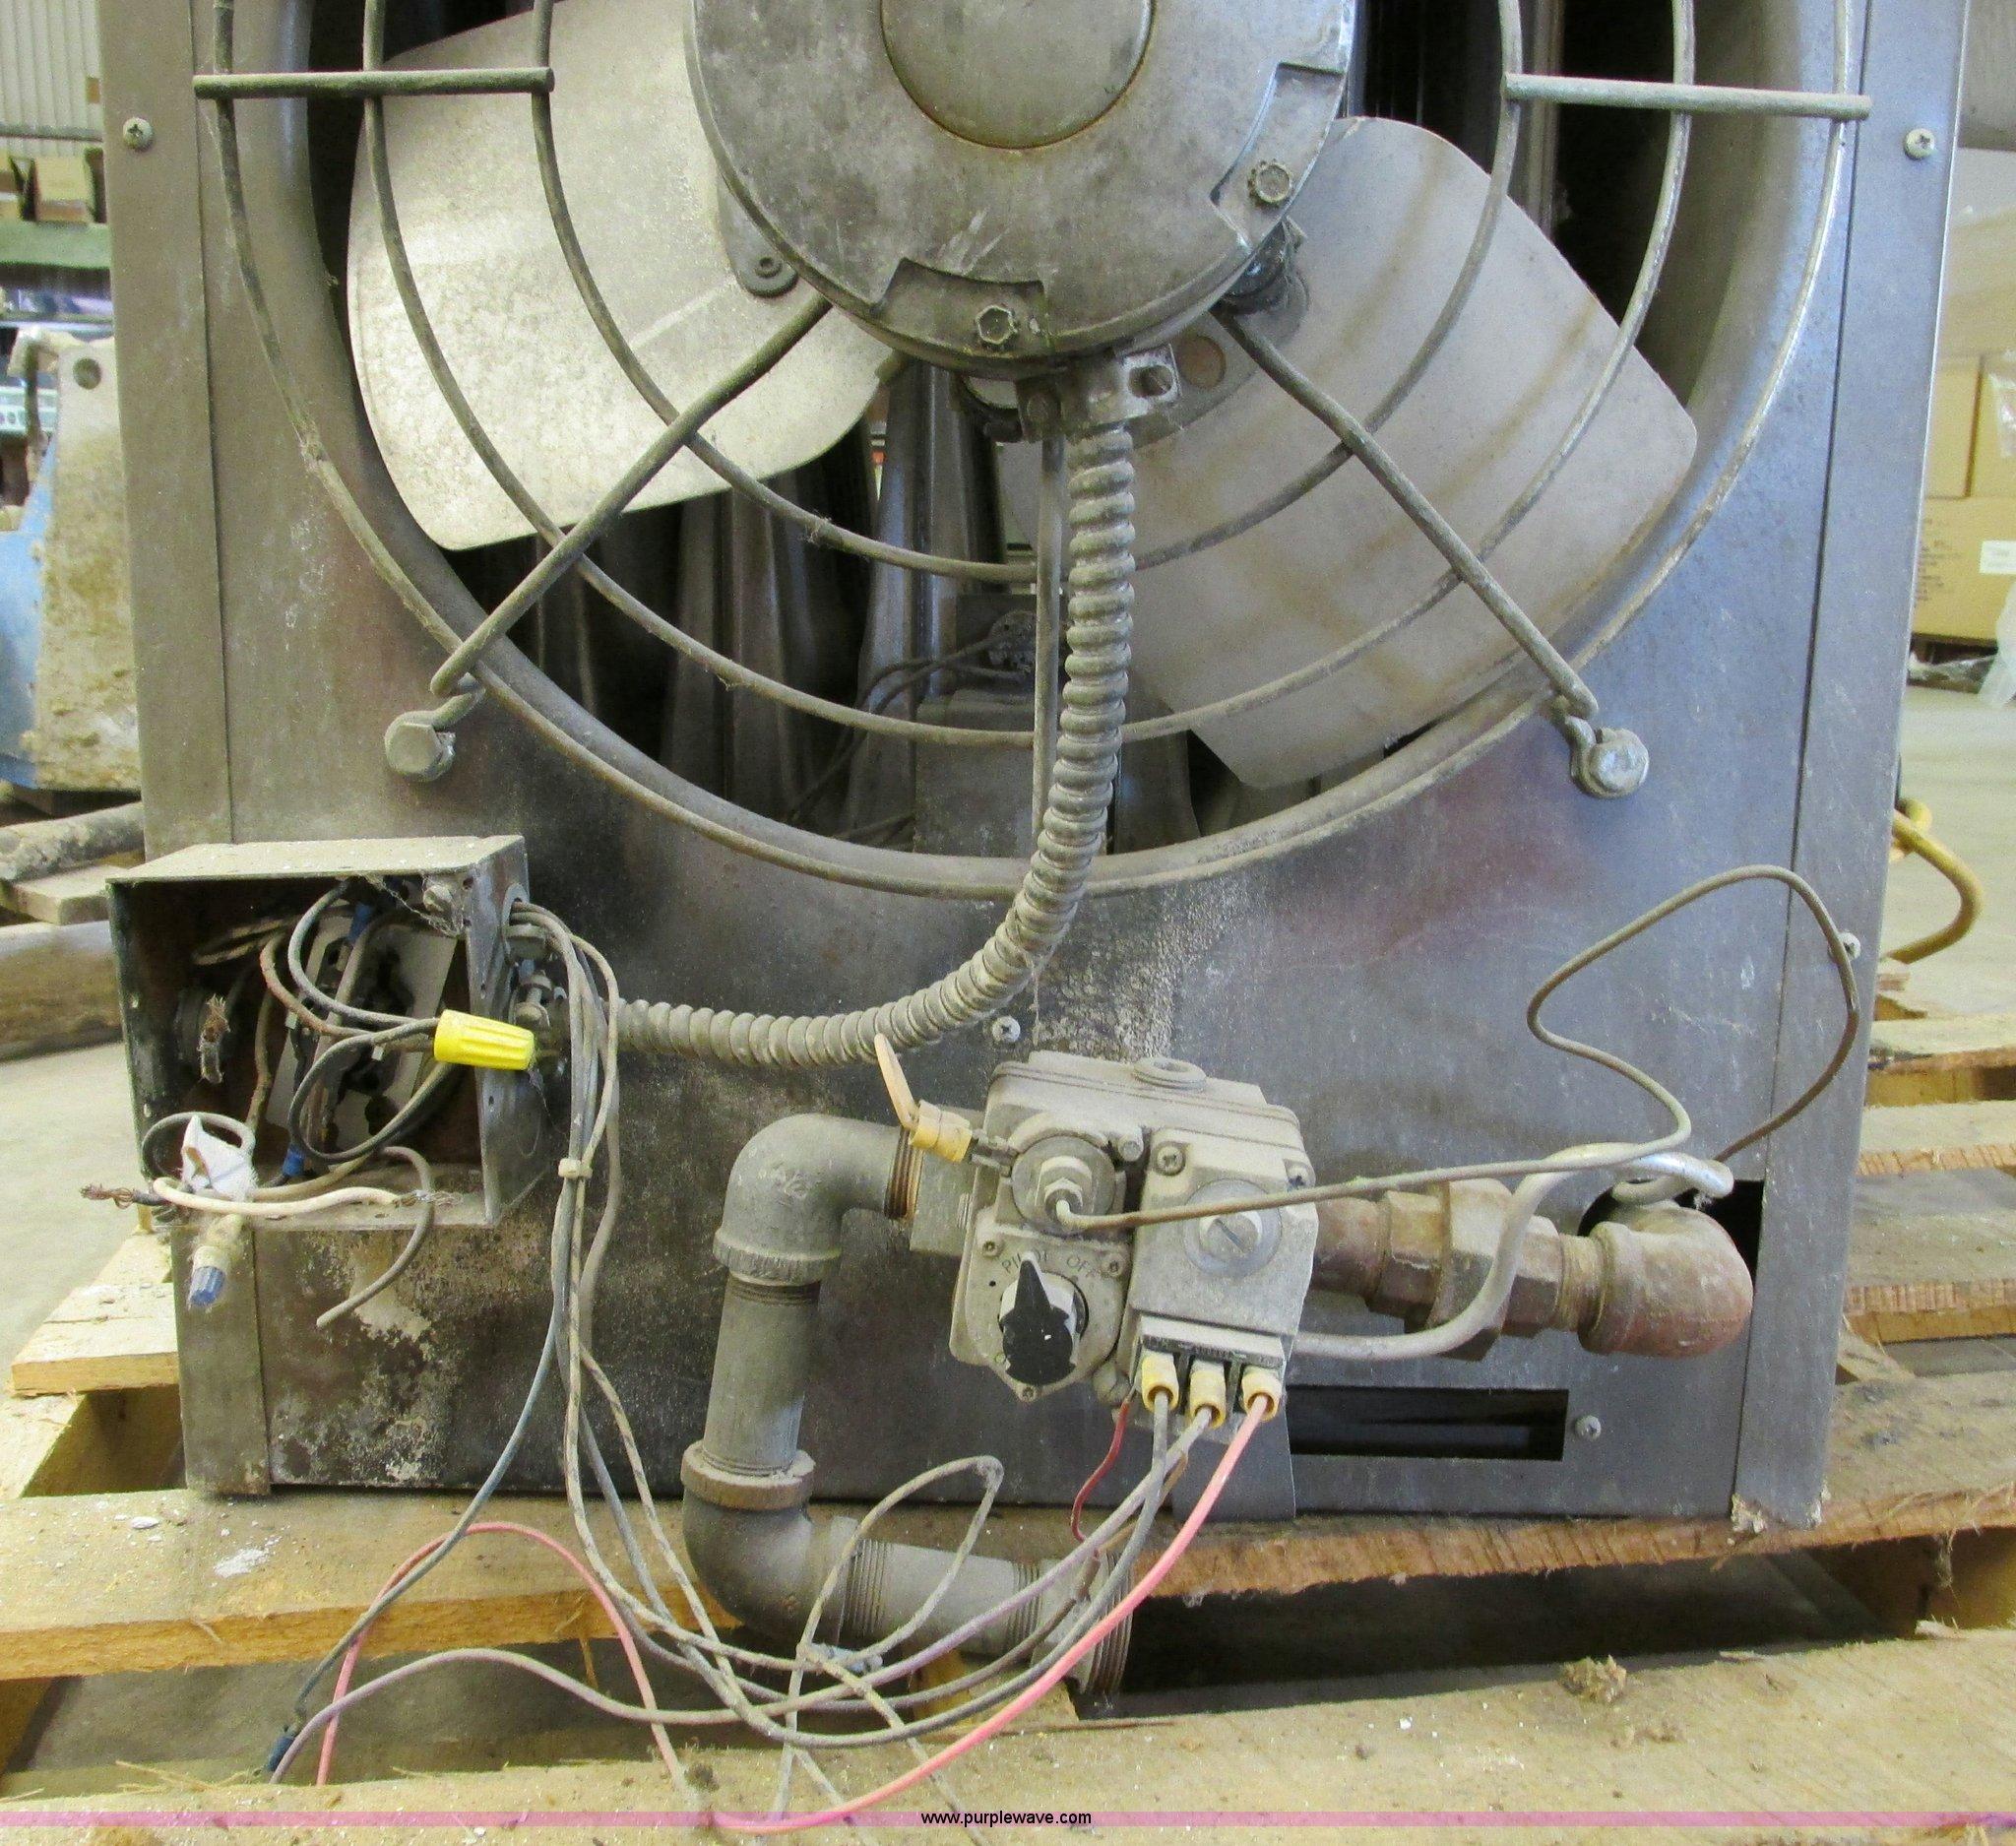 Grinnell Pto 150 Heater Wiring Diagrams Not Lossing Diagram Cub Cadet 2155 Itt Excello 000 Btu Natural Item F4157 Sold Rh Purplewave Com